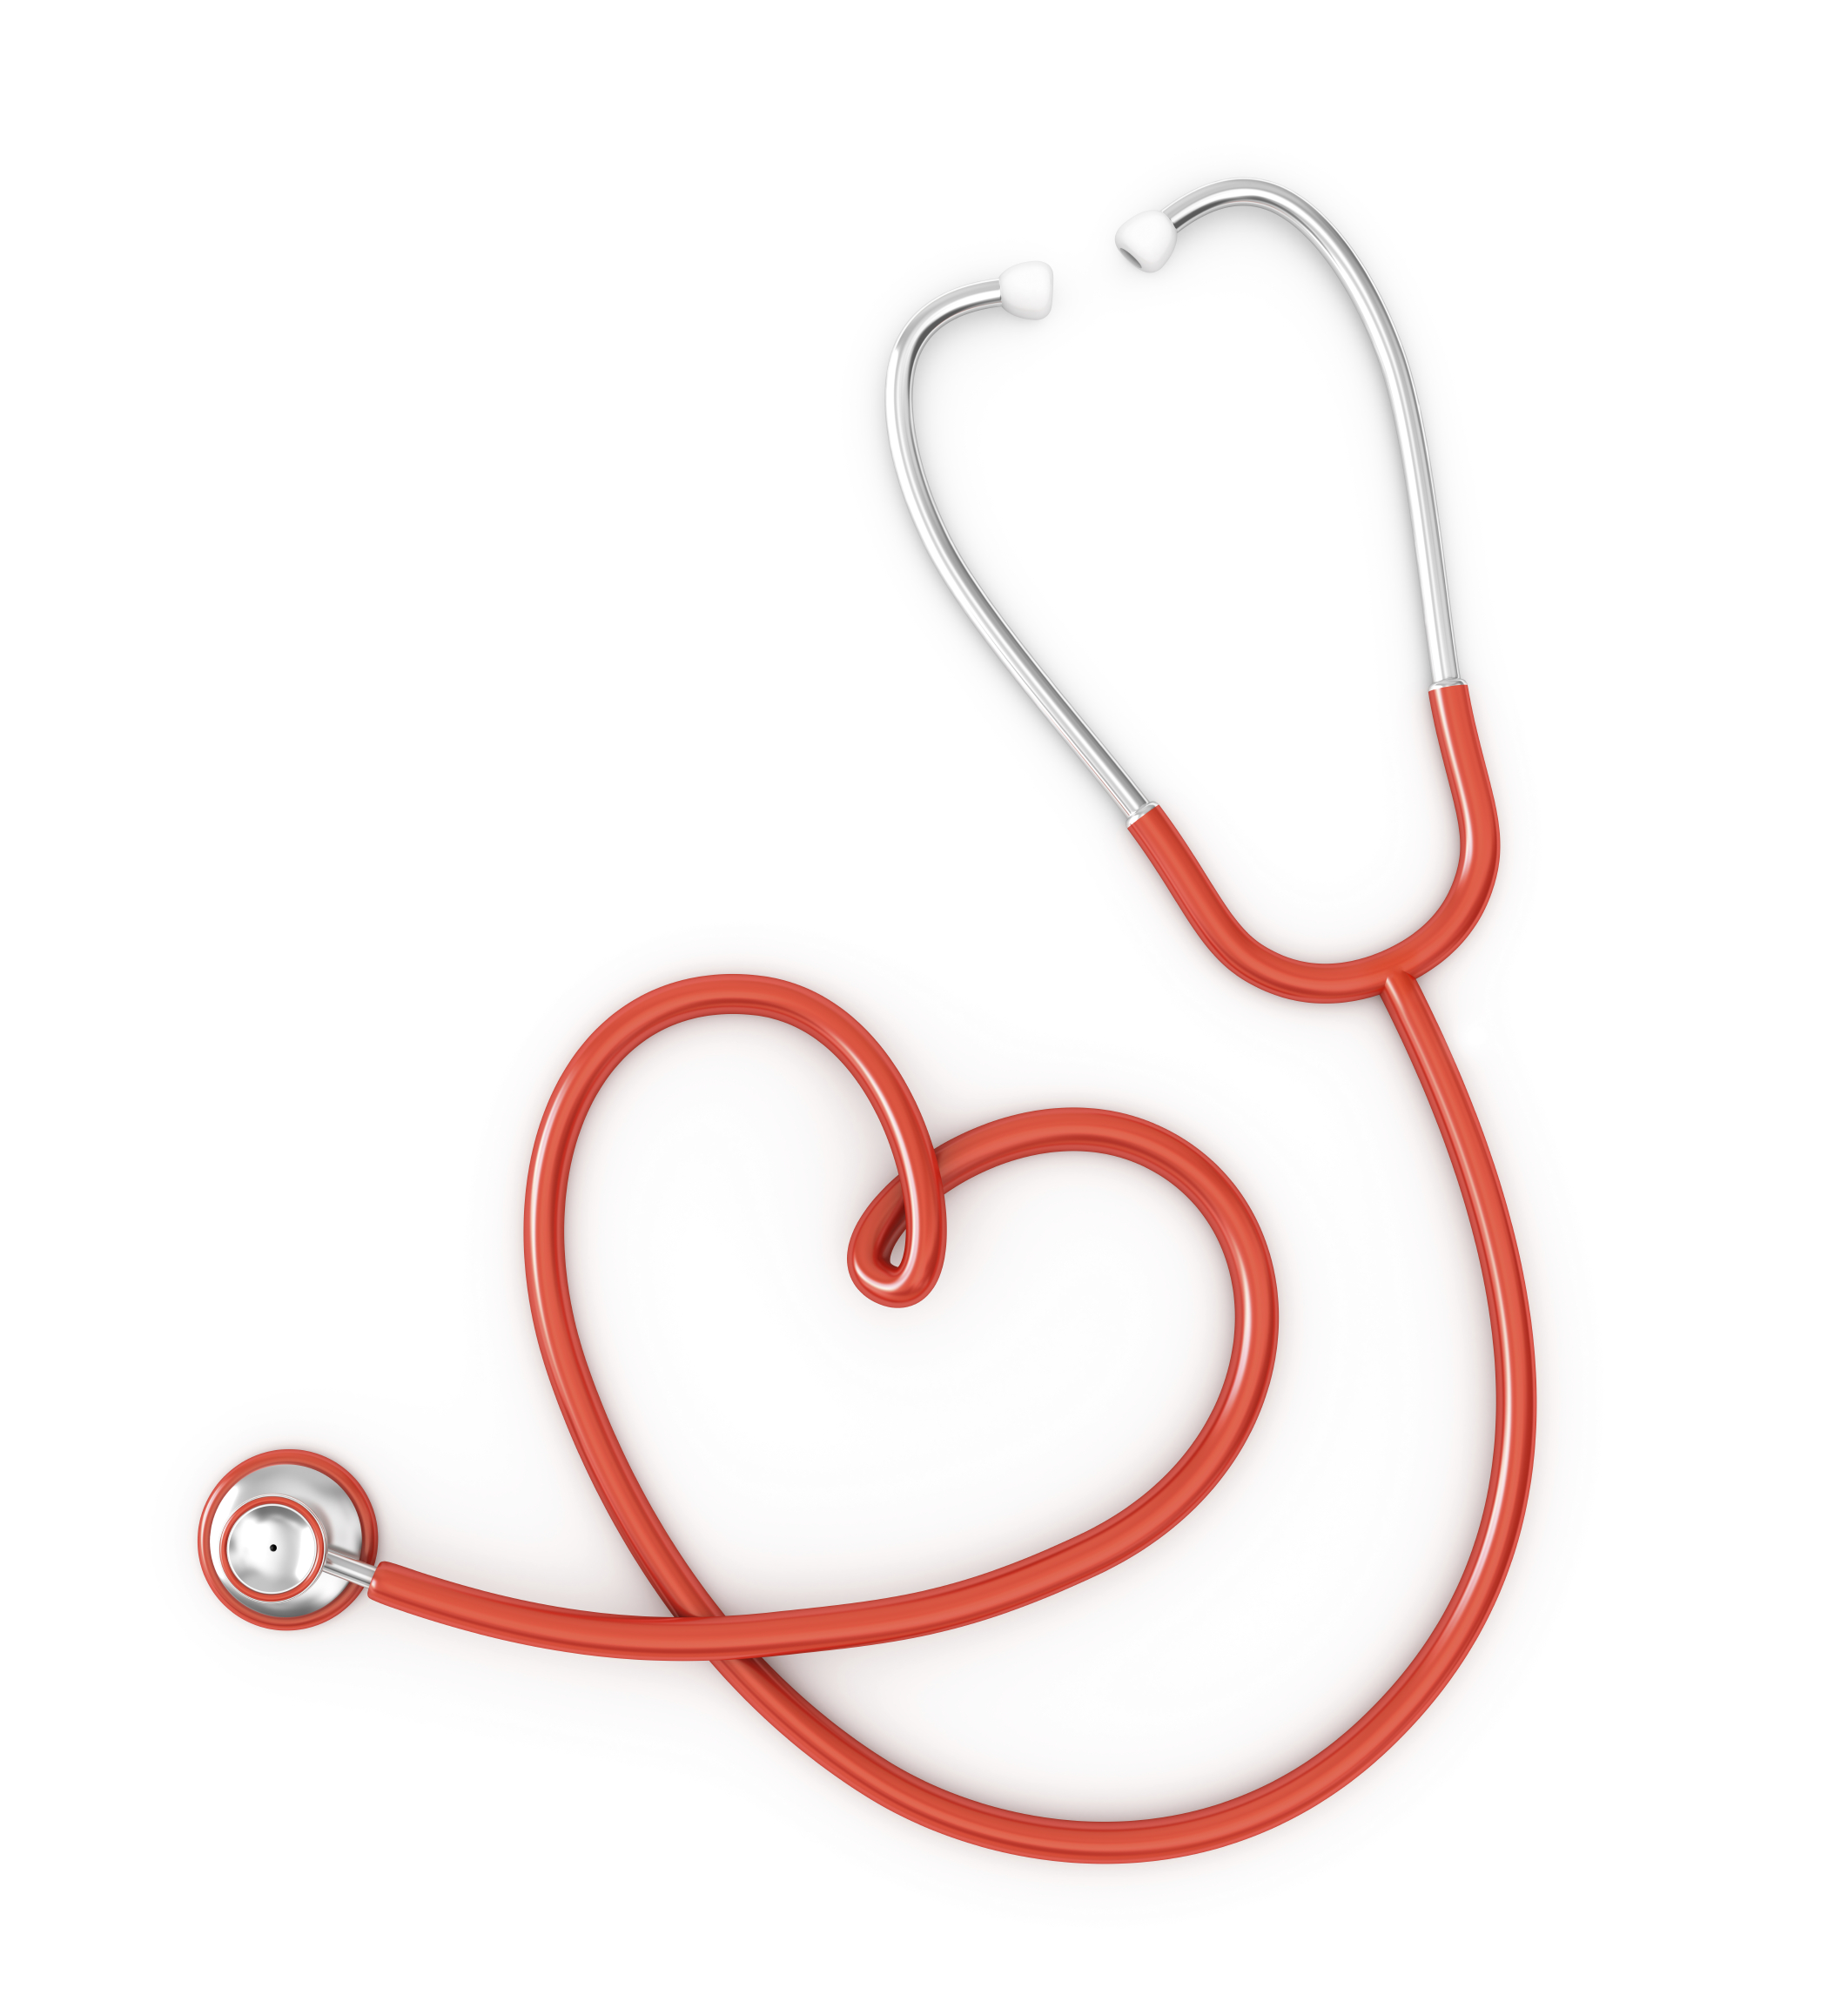 Orange stethoscope clipart the cliparts